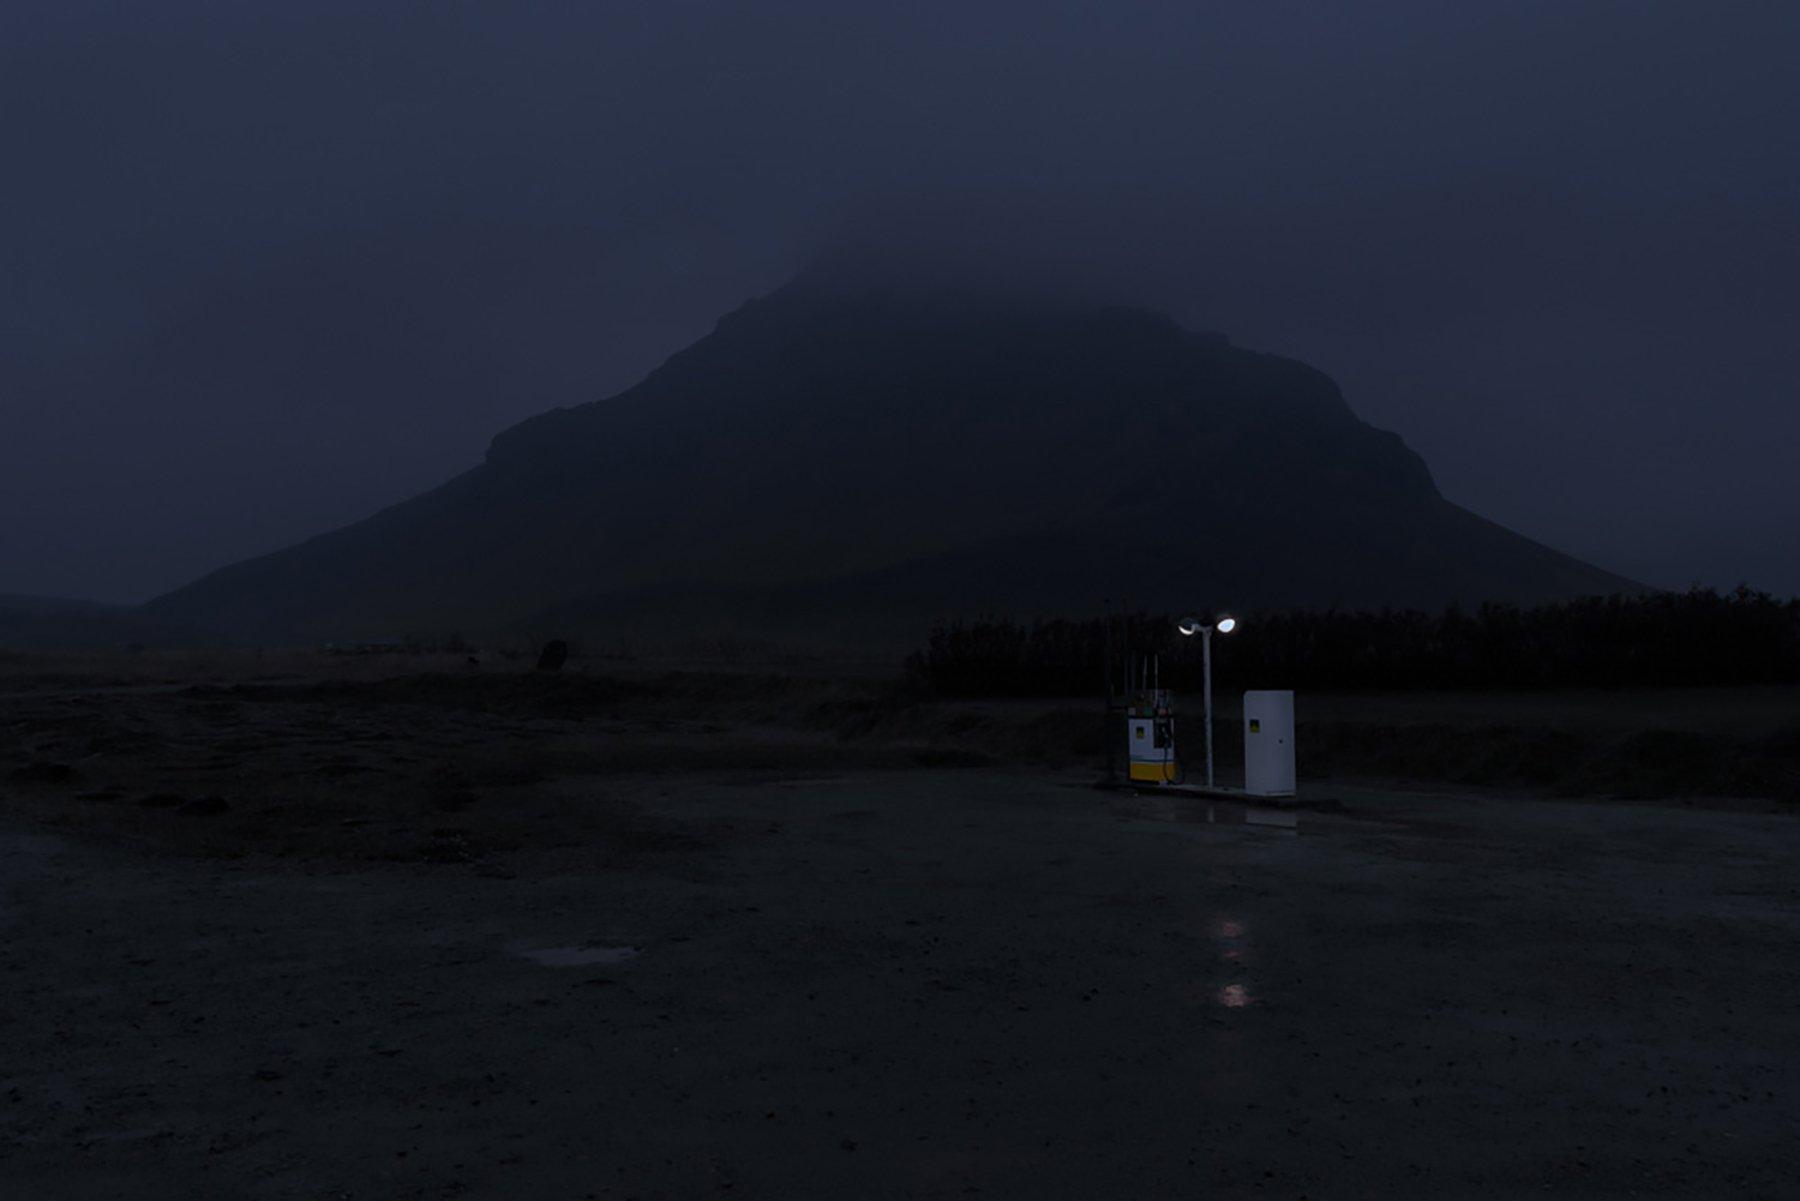 iGNANT-Julien-Mauve-After-Lights-Out-12